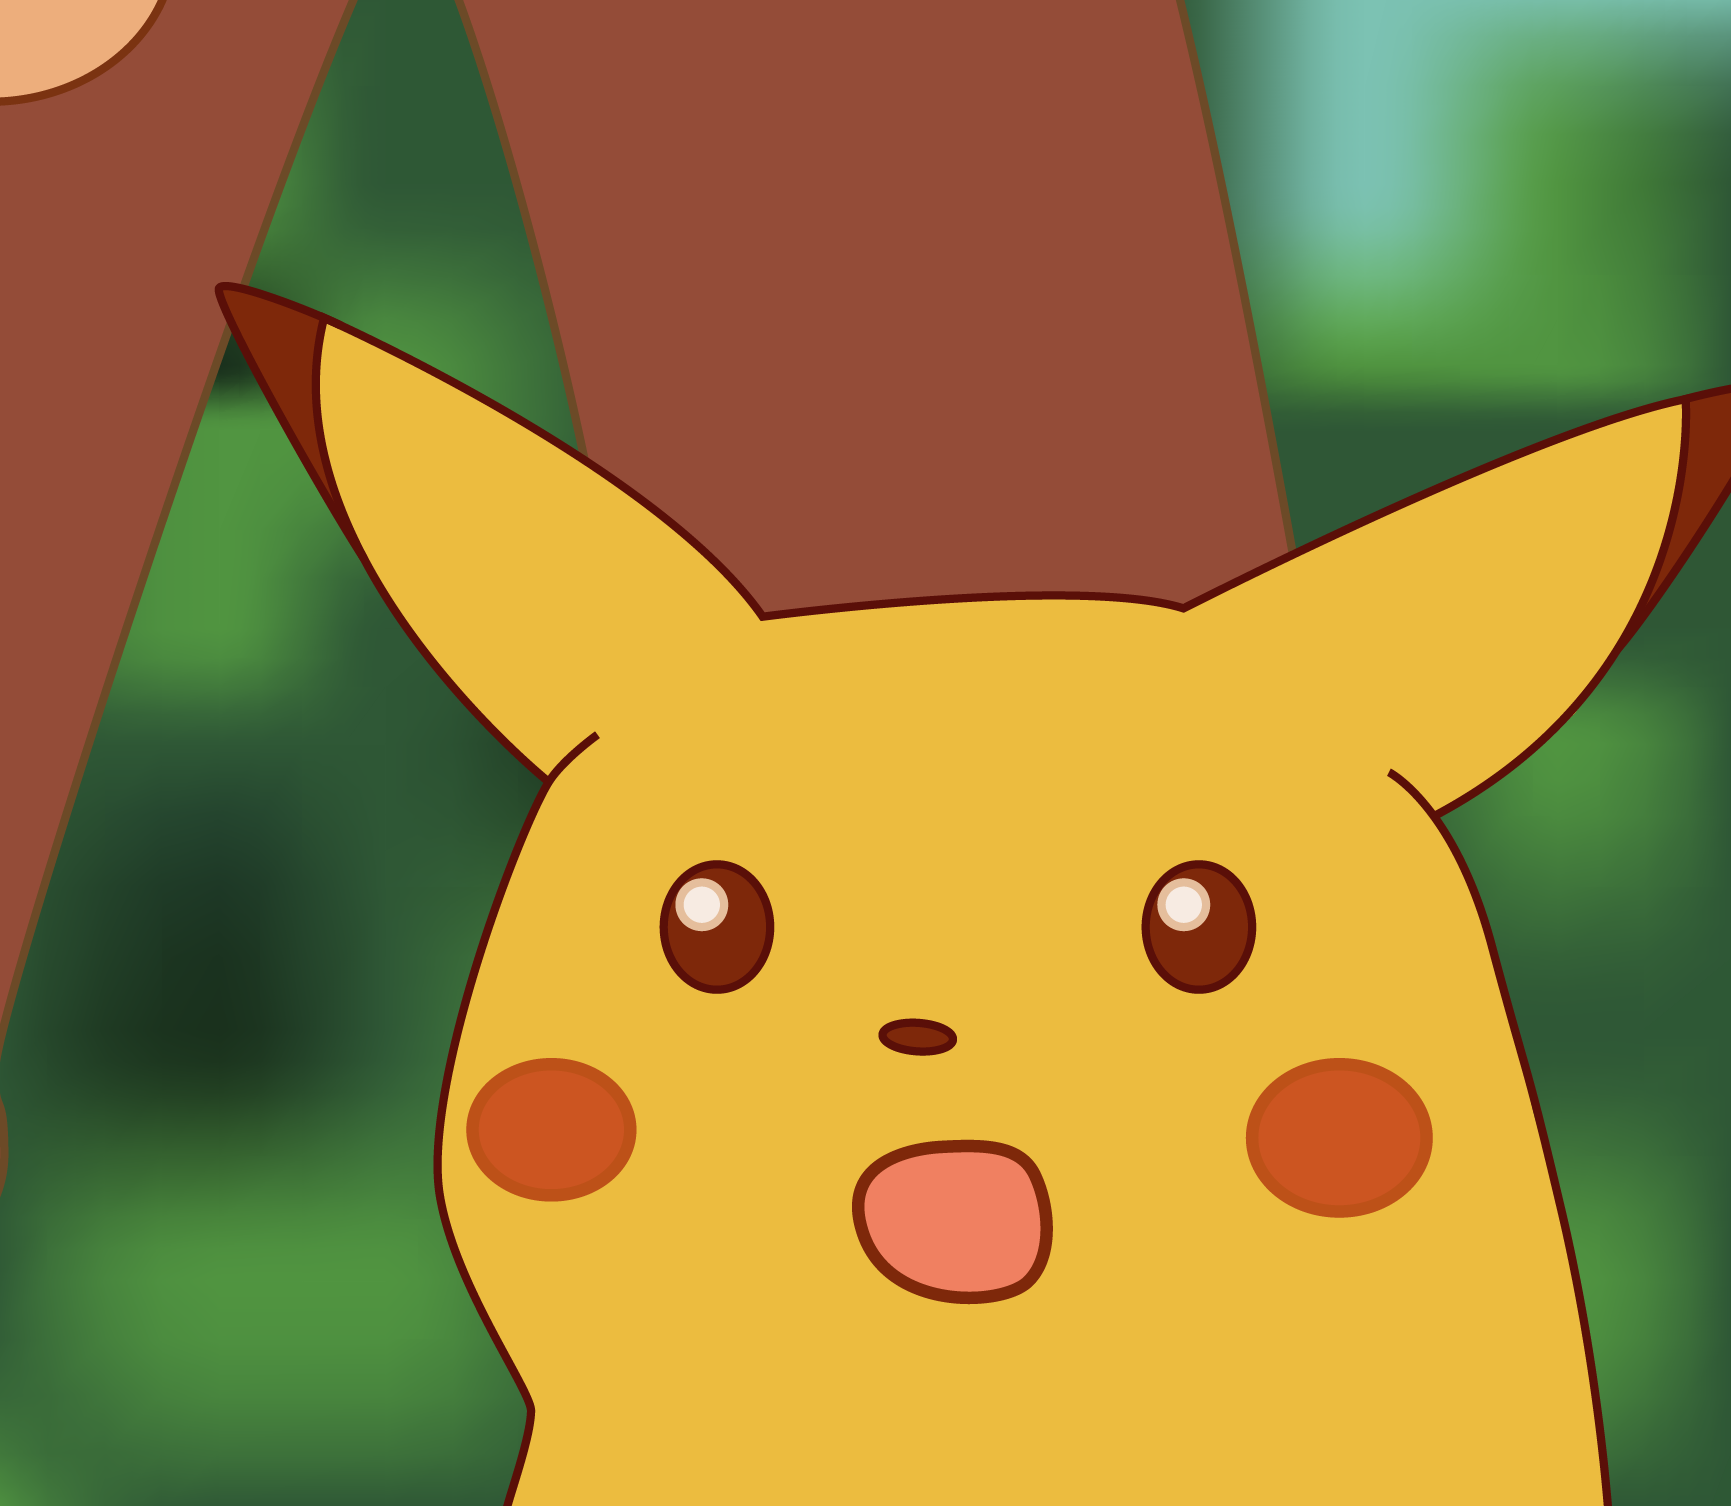 Hd Version Surprised Pikachu Painting Memes Pikachu Memes Aesthetic Memes